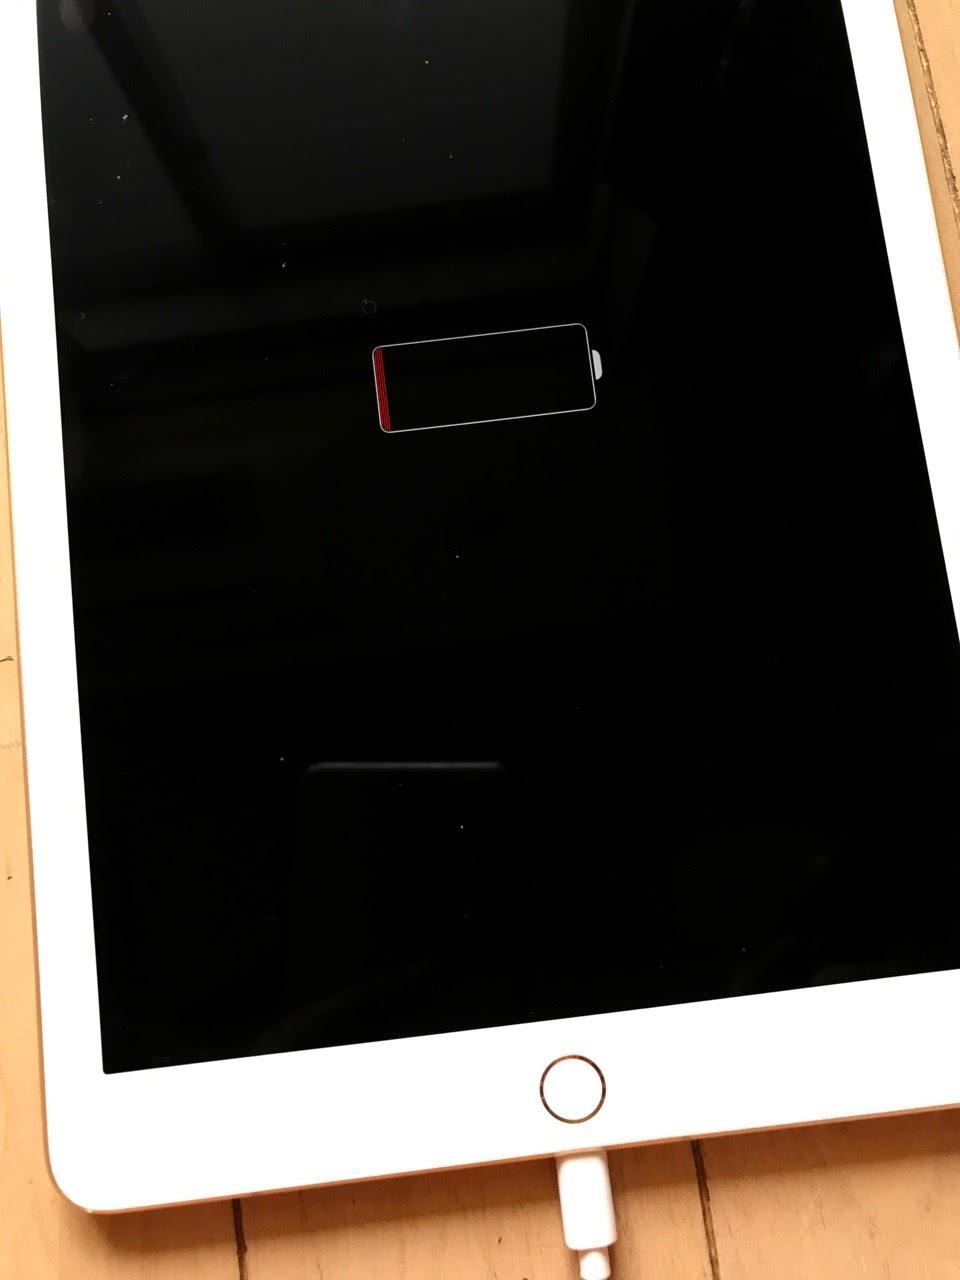 Ipad 充電 停止 中 IPad無法充電!維修前必試3步驟處理-iPad維修推薦-Dr.A